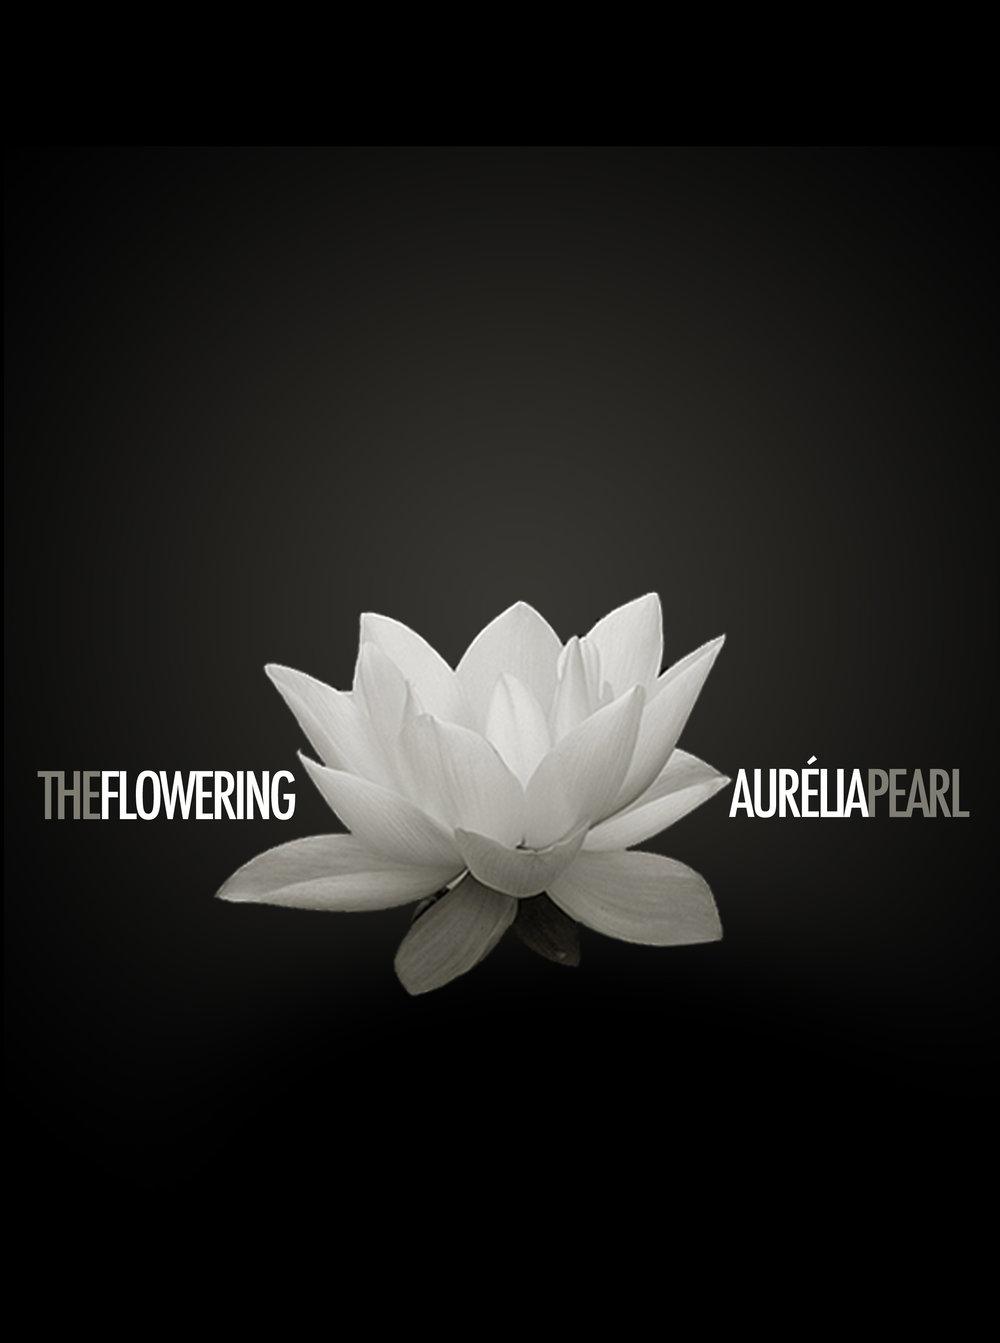 theflowering11-5.jpg